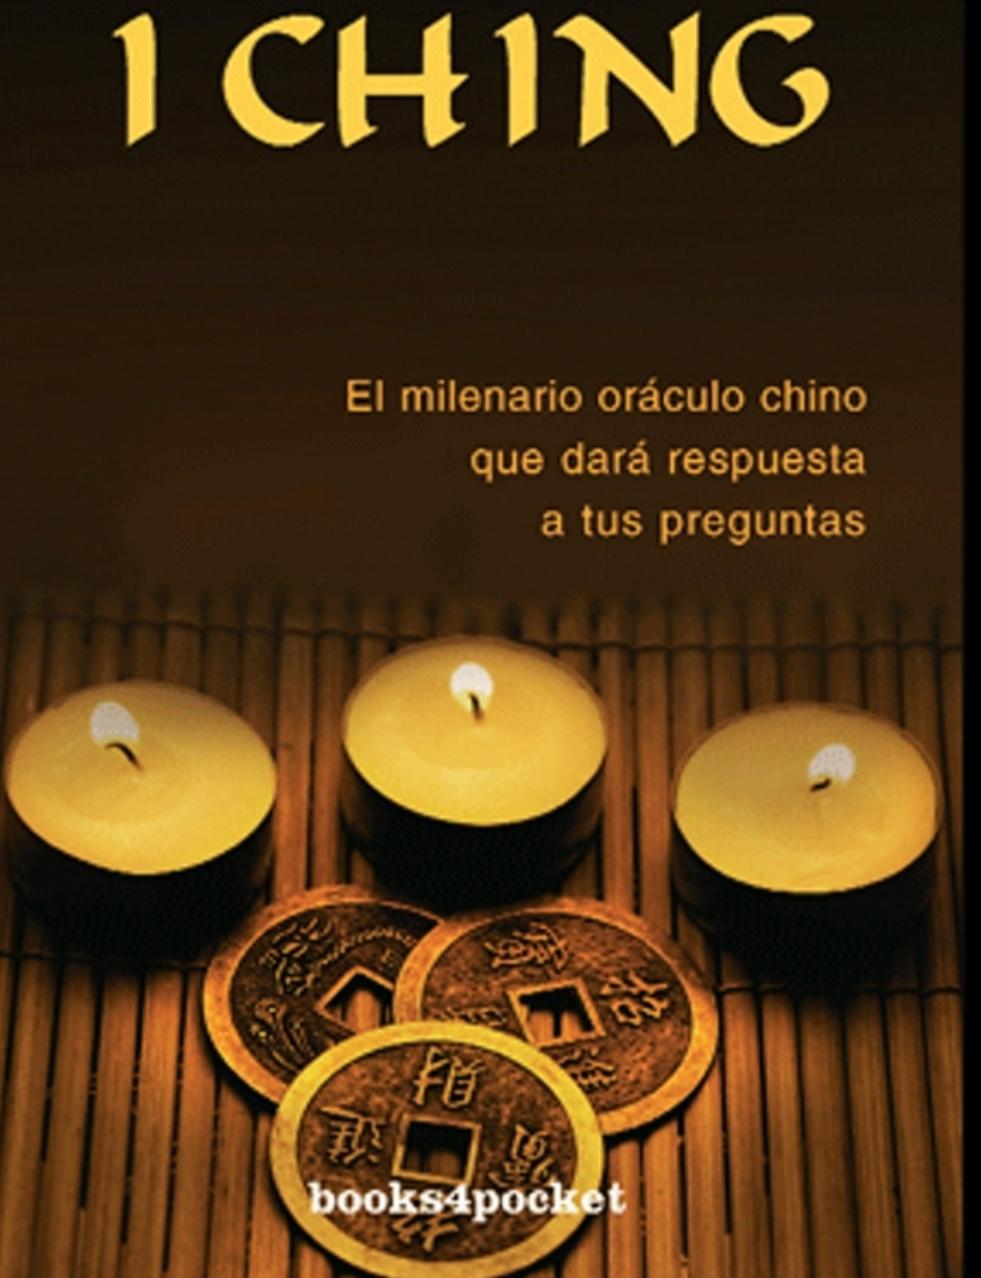 Memoradio Simero 5 De El I Ching Por La V. M Amsa🌻